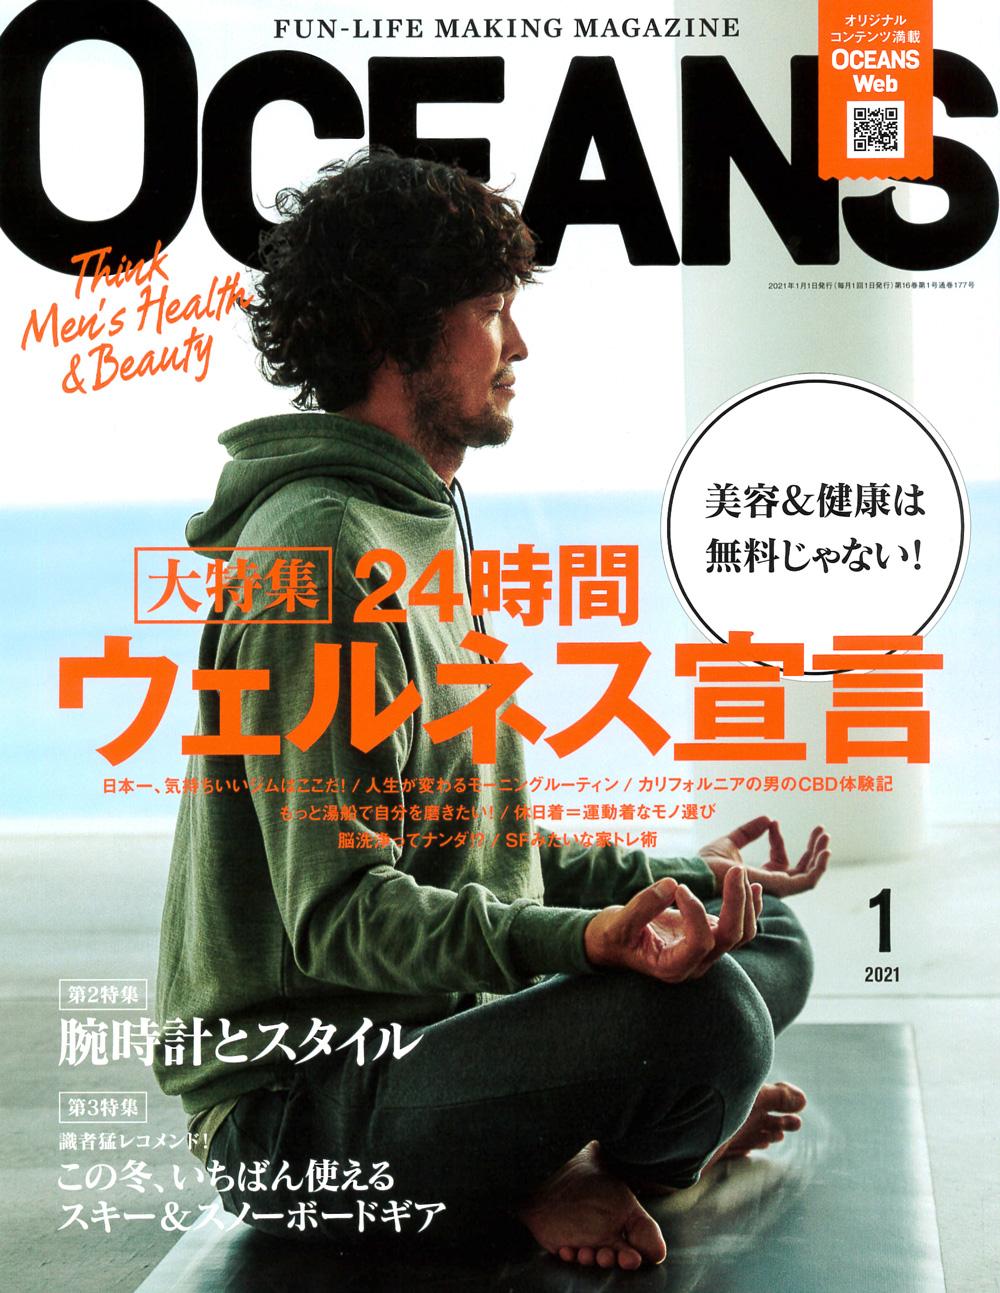 OCEANS 1月号掲載情報:ELECTRIC